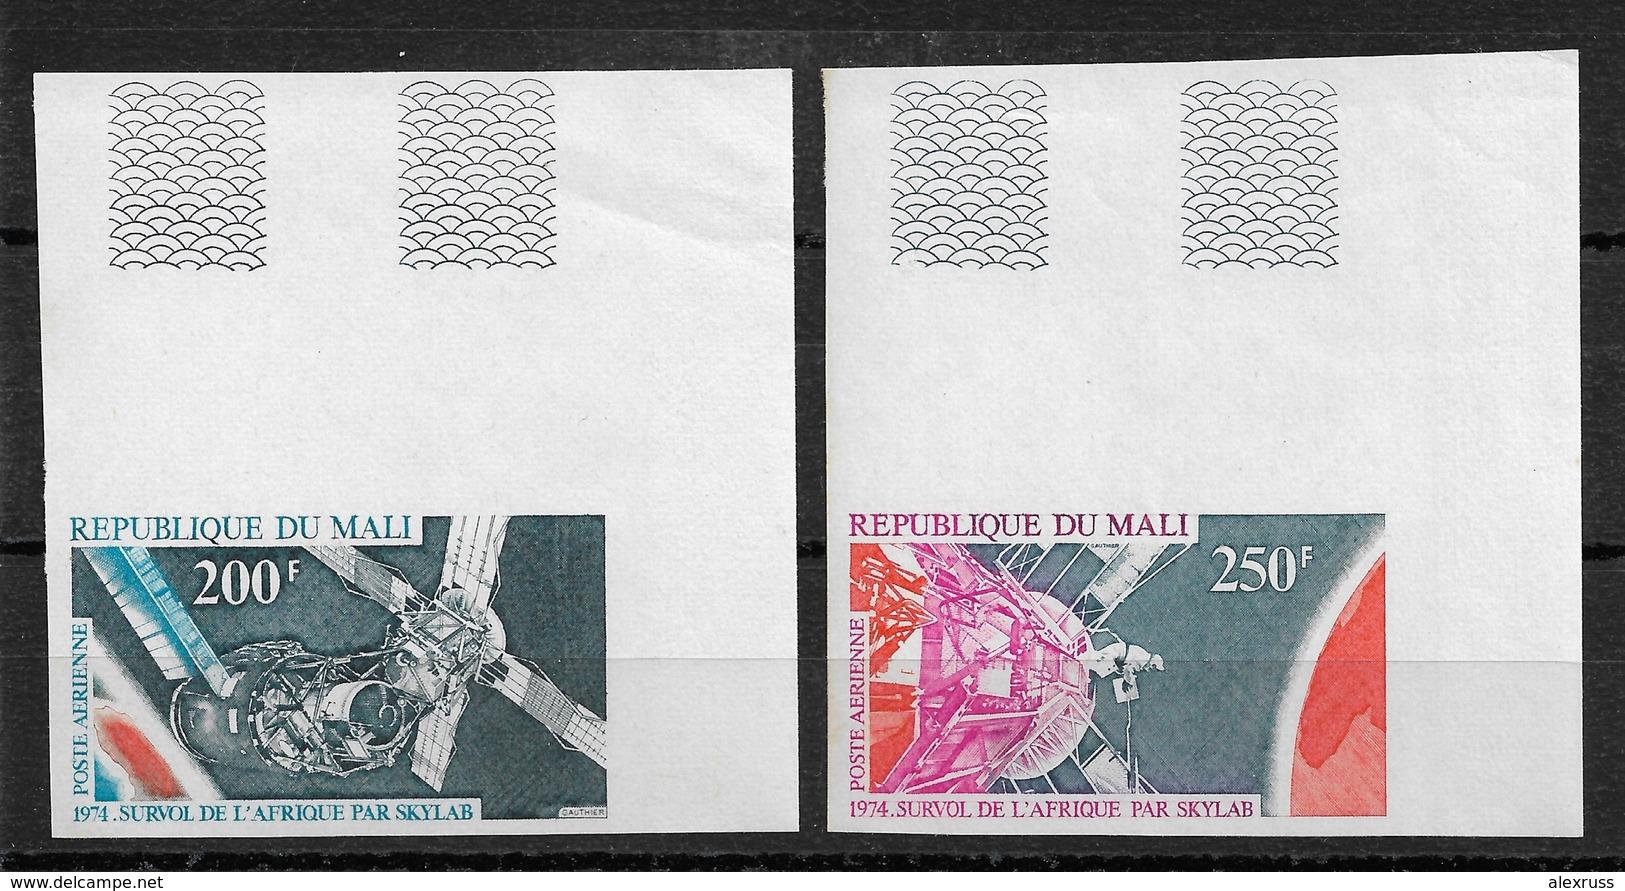 MALI 1974 SPACE IMPERF SCOTT # C220-C221,VF-XF MNH** (RN-8) - Mali (1959-...)